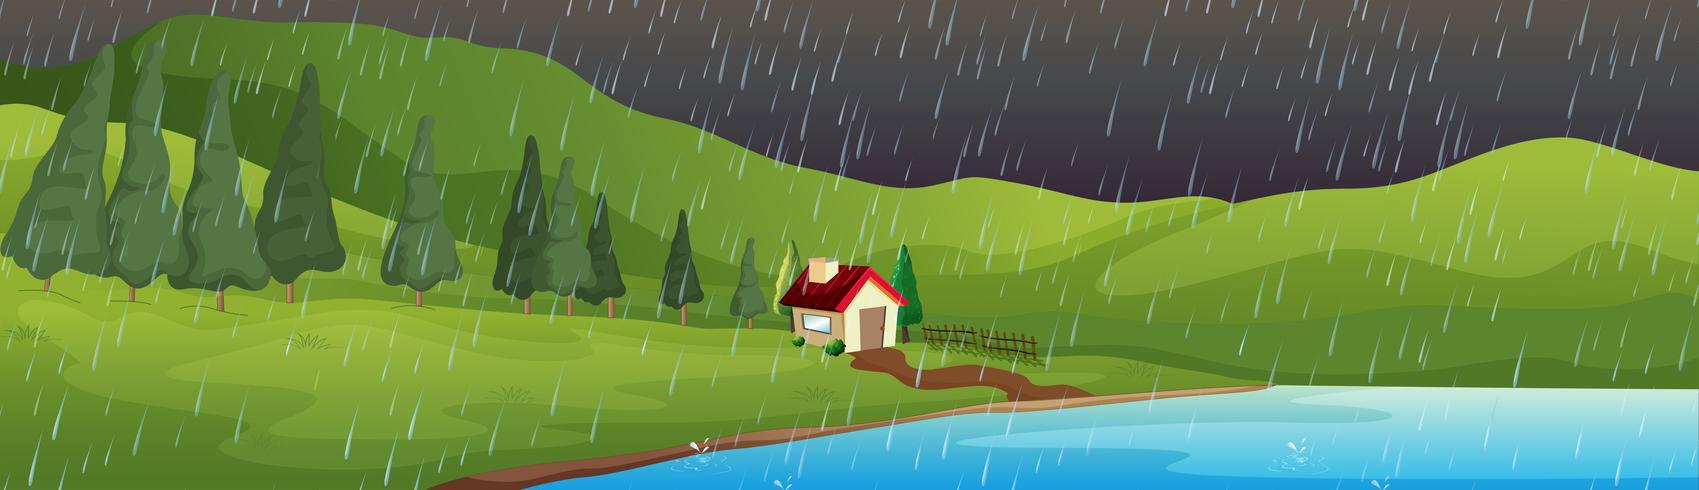 Bakgrundsscen med hus vid sjön i regnet vektor